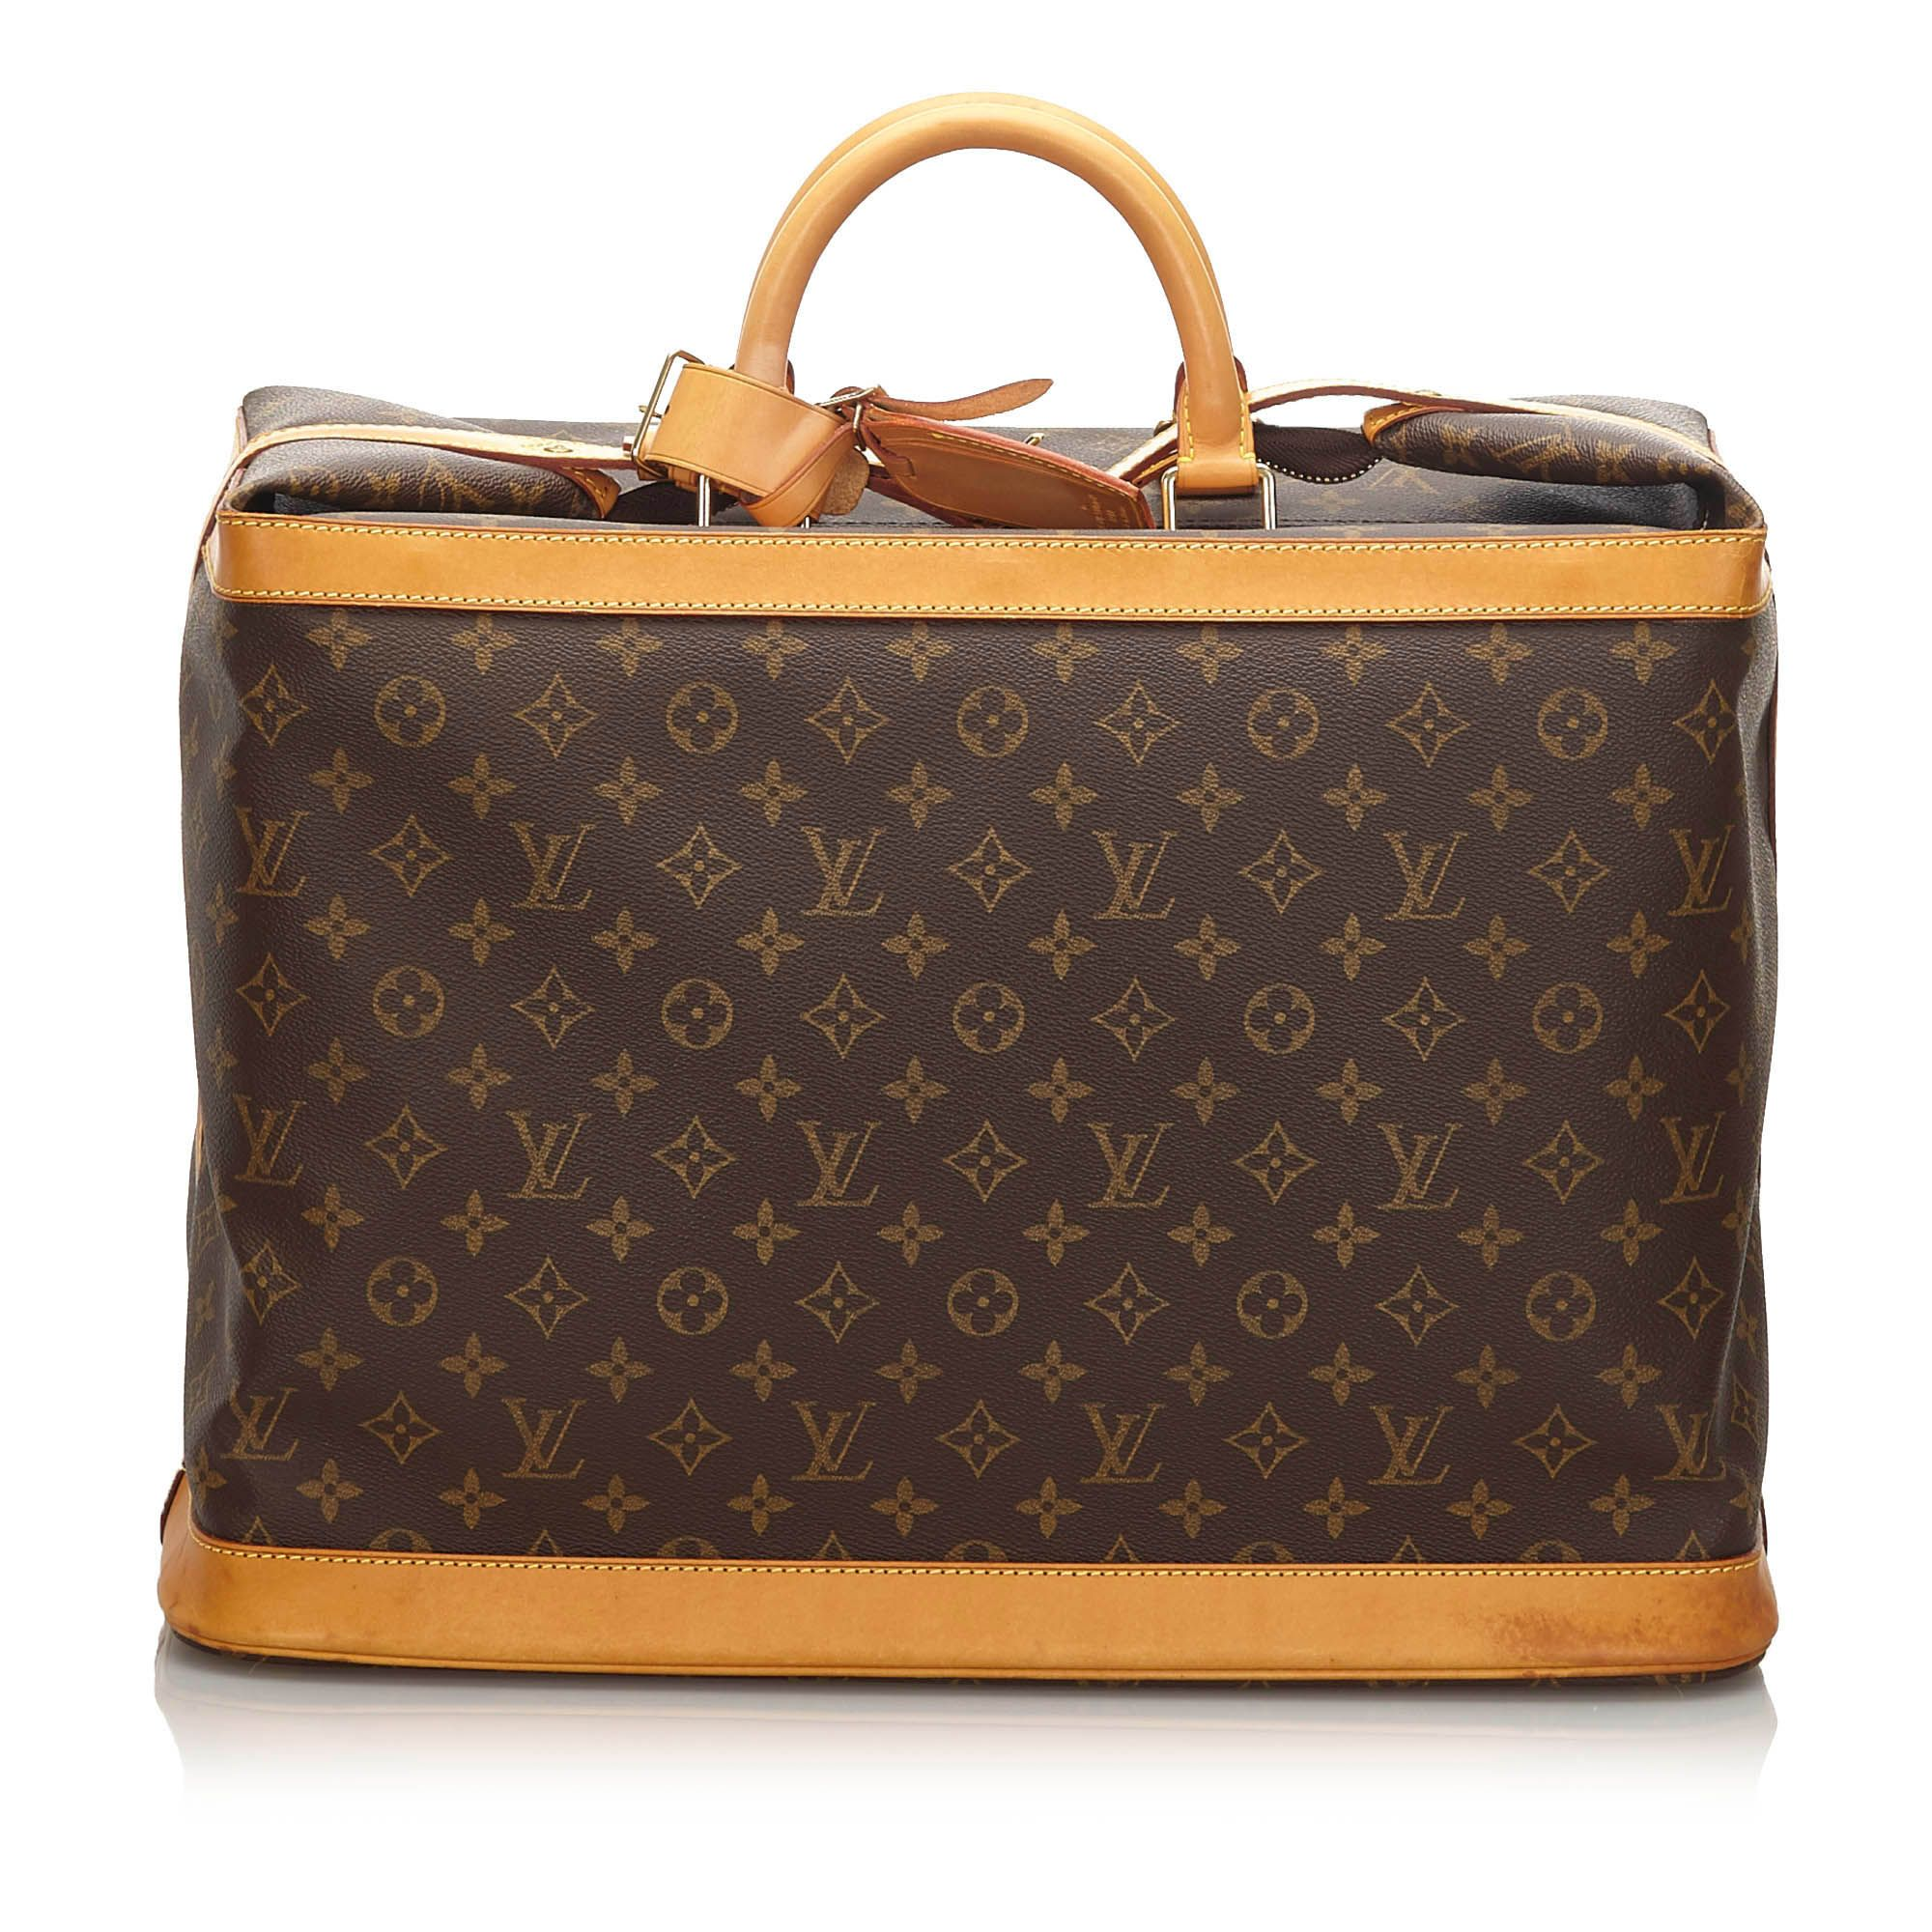 Vintage Louis Vuitton Monogram Cruiser 40 Brown